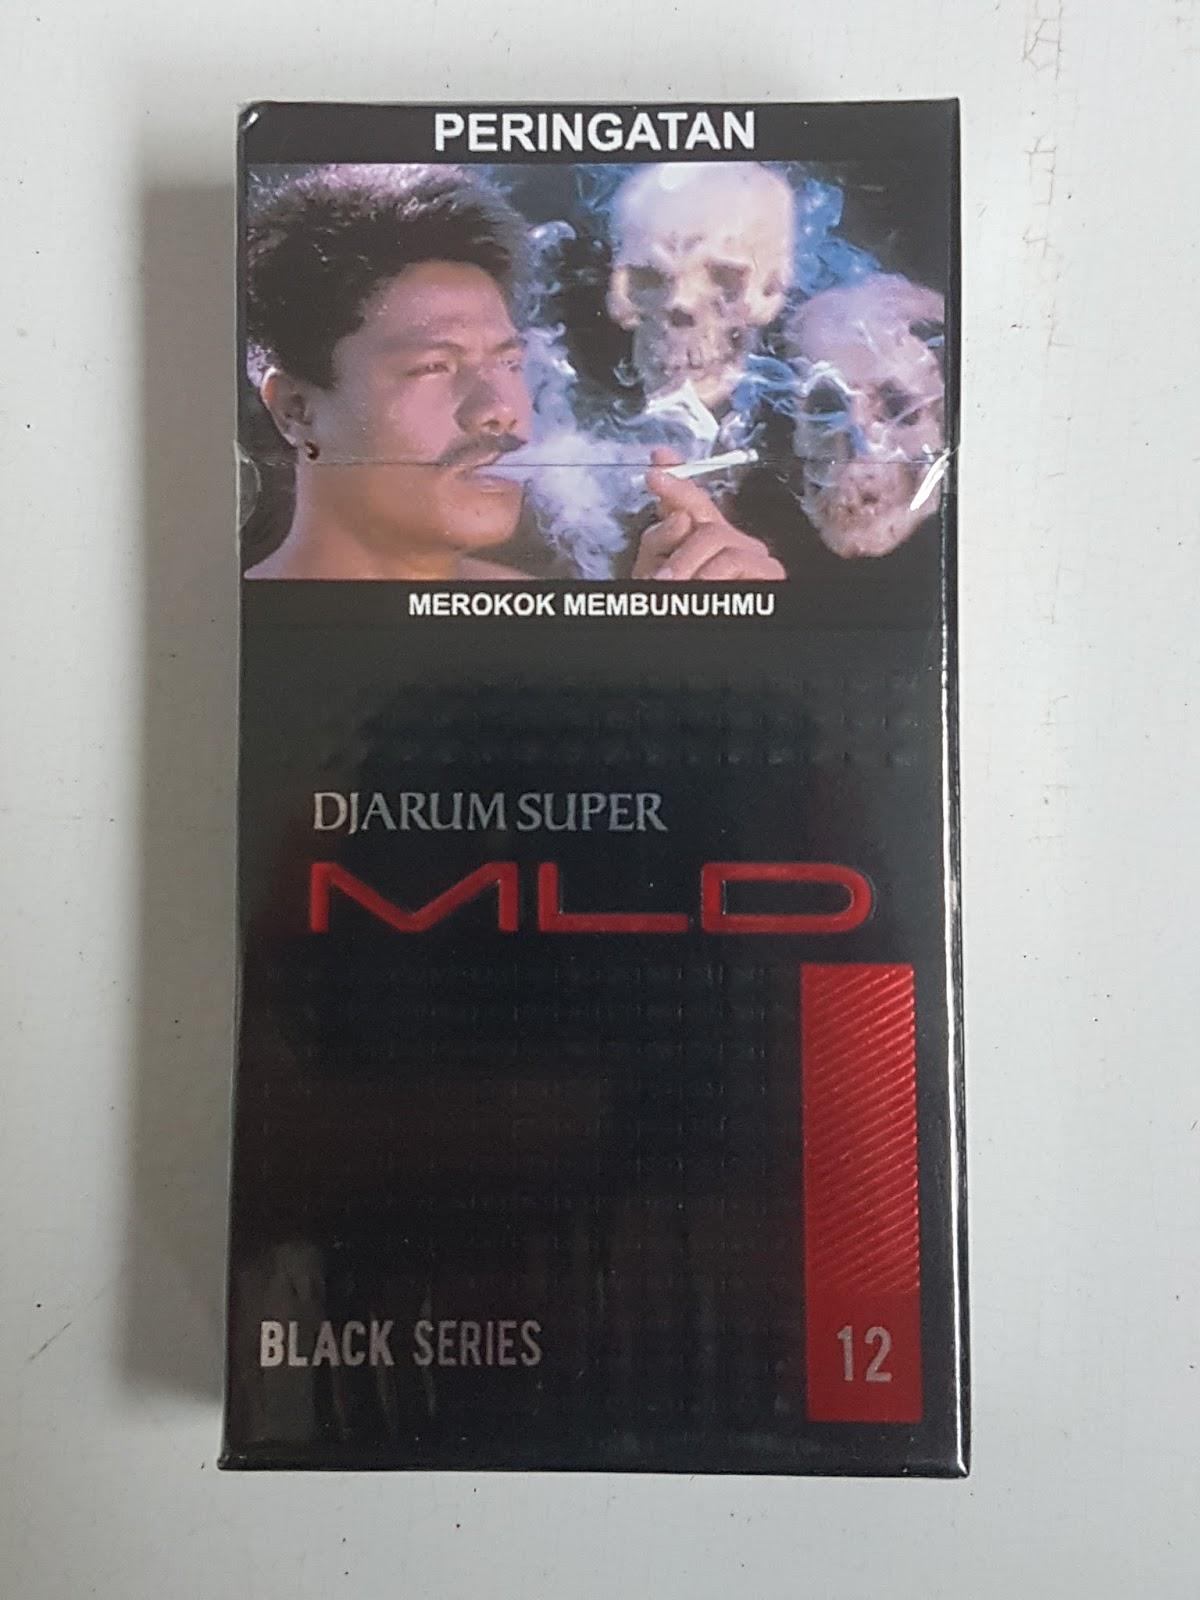 Djarum Super Mld Mild Black Series Isi 12 Batang Rokok Kadar Tar Sampoerna A Merah 16 Pcs Pada Bagian Depan Dan Belakang Kemasan Memiliki Warna Dasar Hitam Tua Serta Silver Dimana Dalam Hal Ini Atas Dekat Peringatan